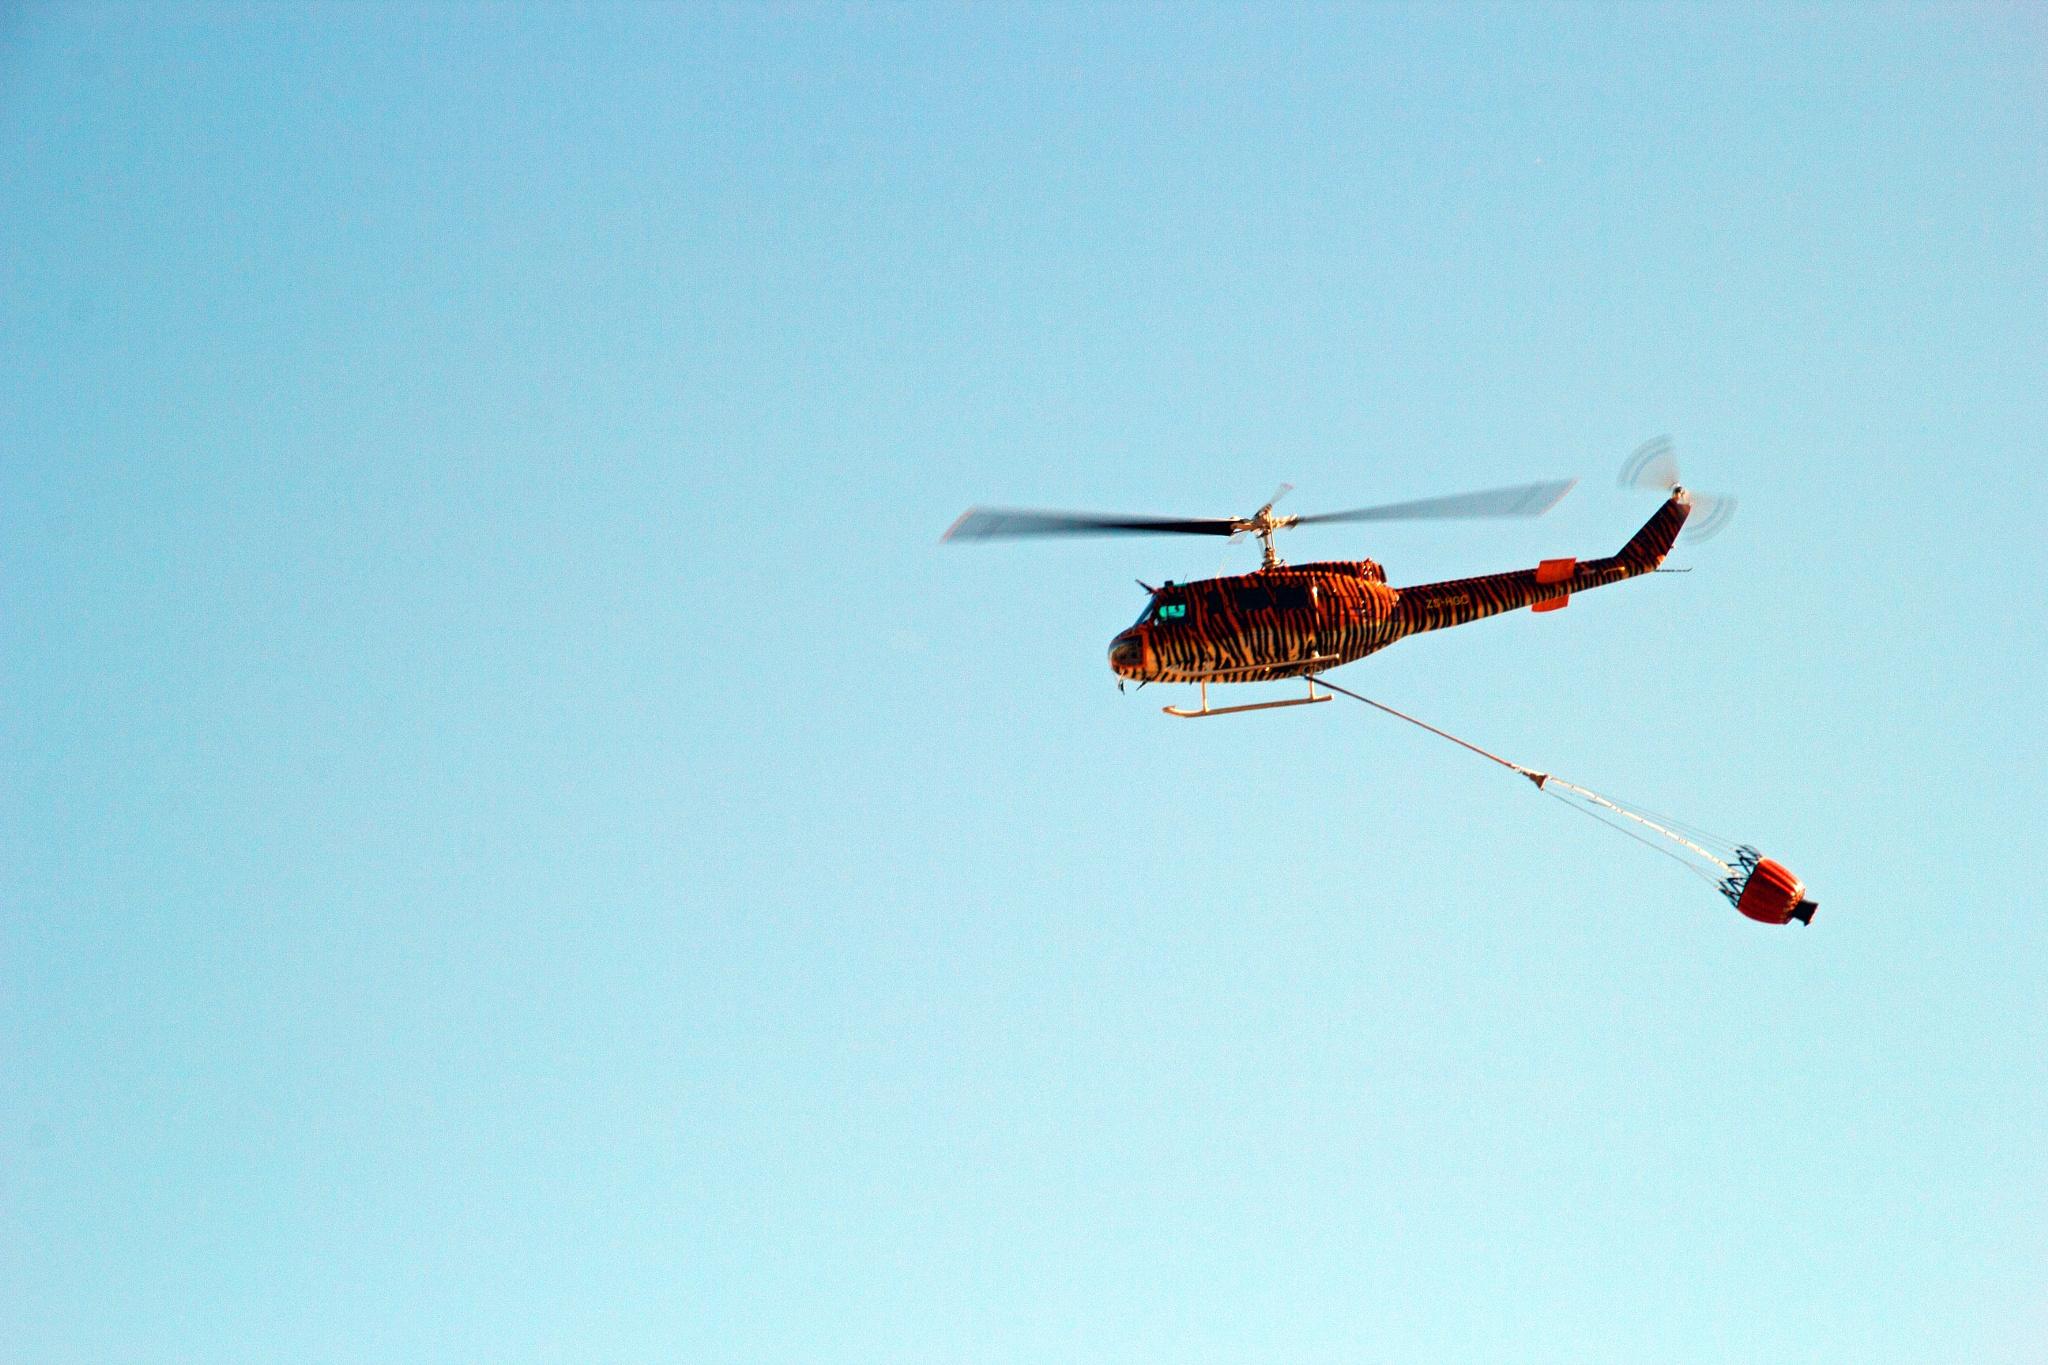 In flight by Nauta Piscatorque